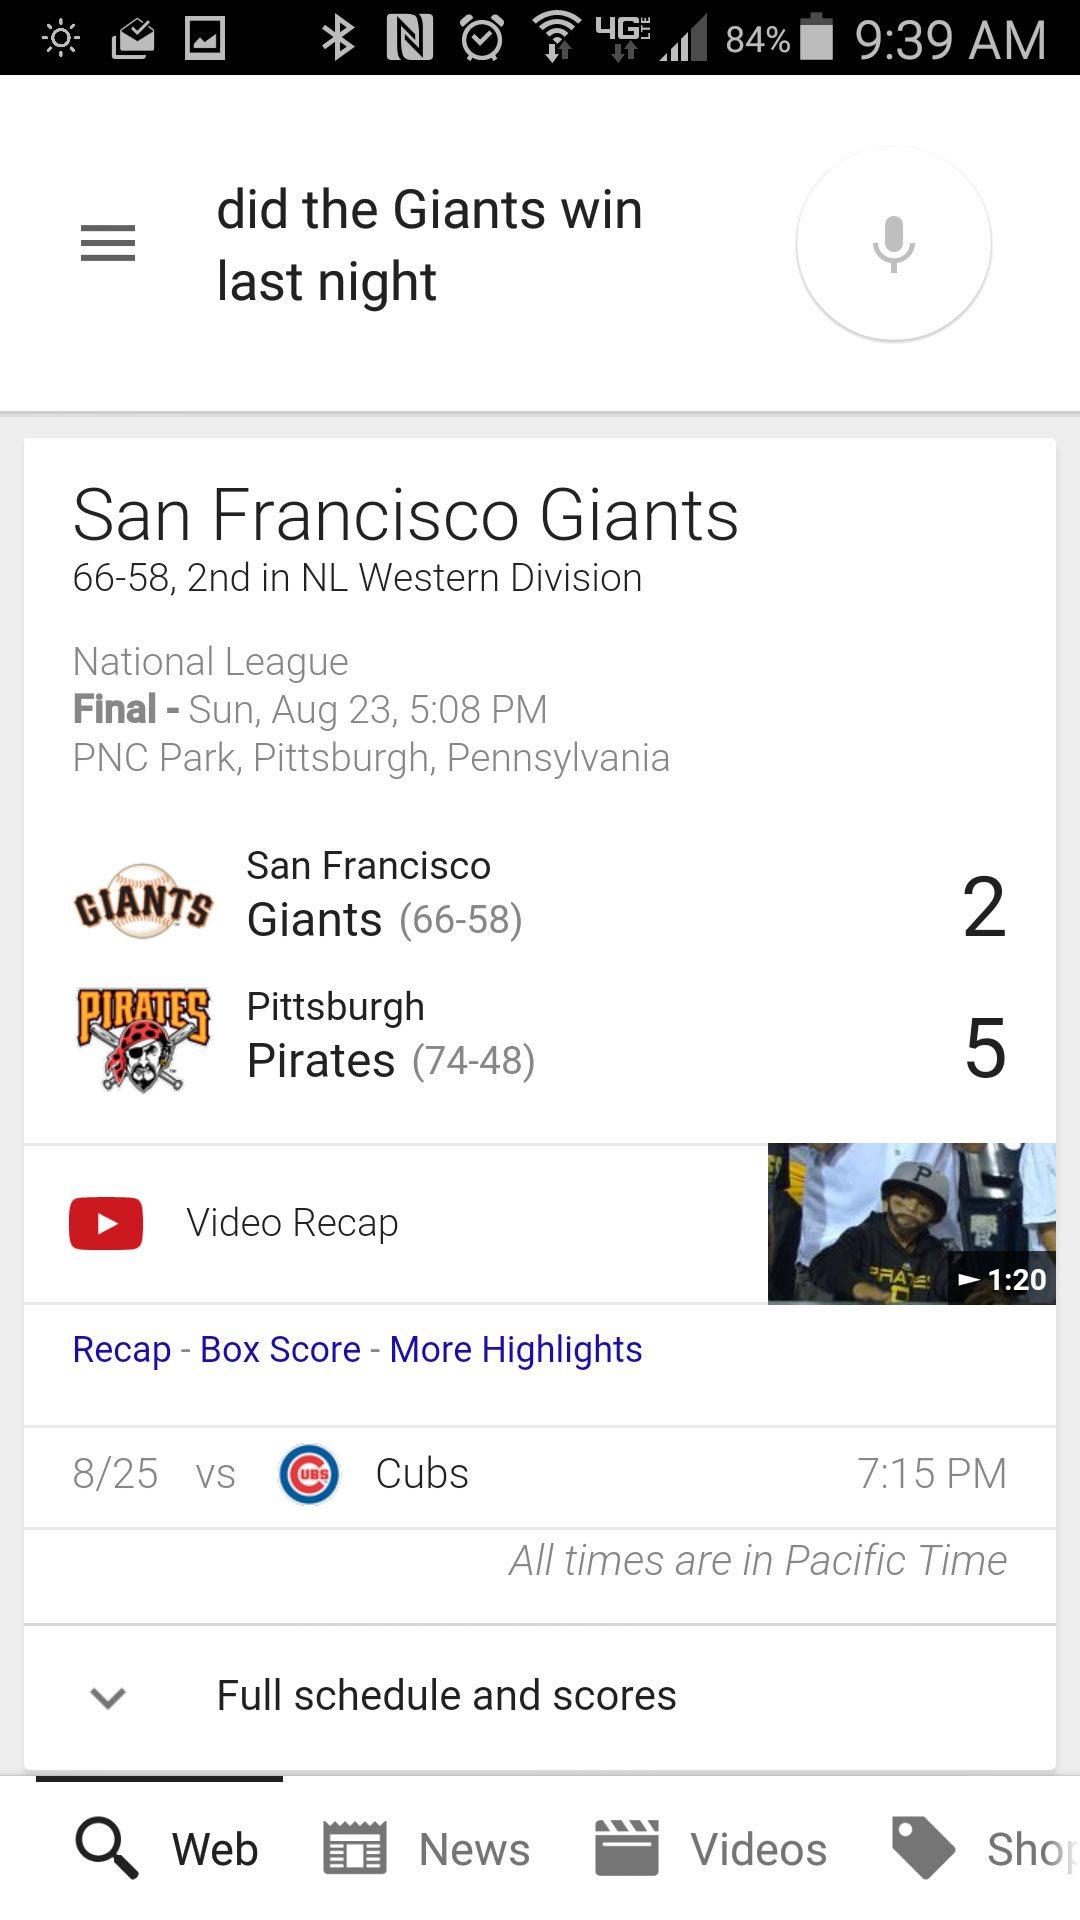 The Giants score via Google Now.